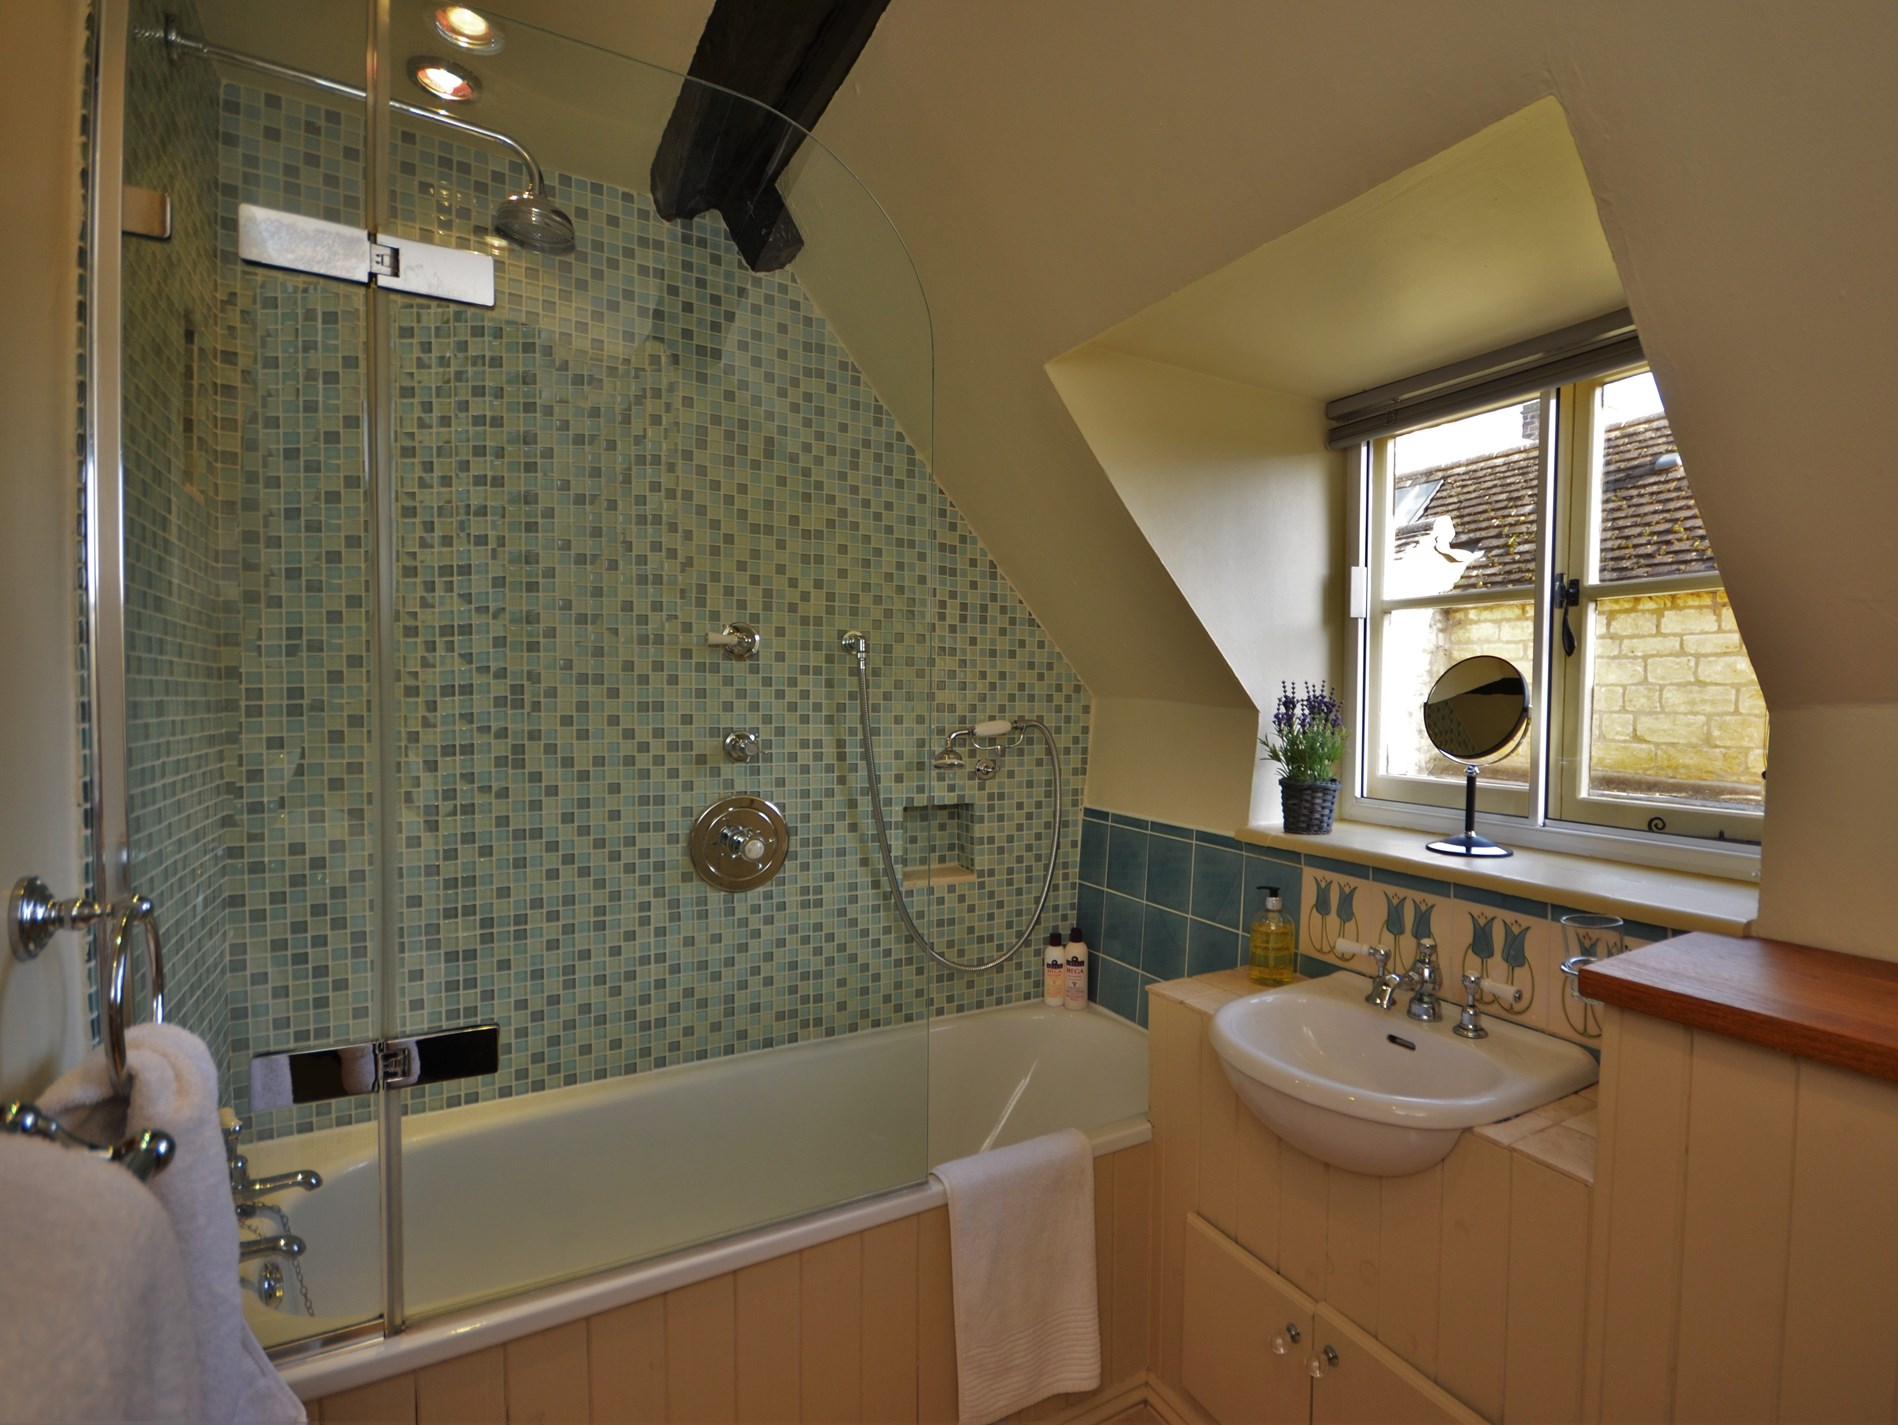 Upstars bathroom with shower over